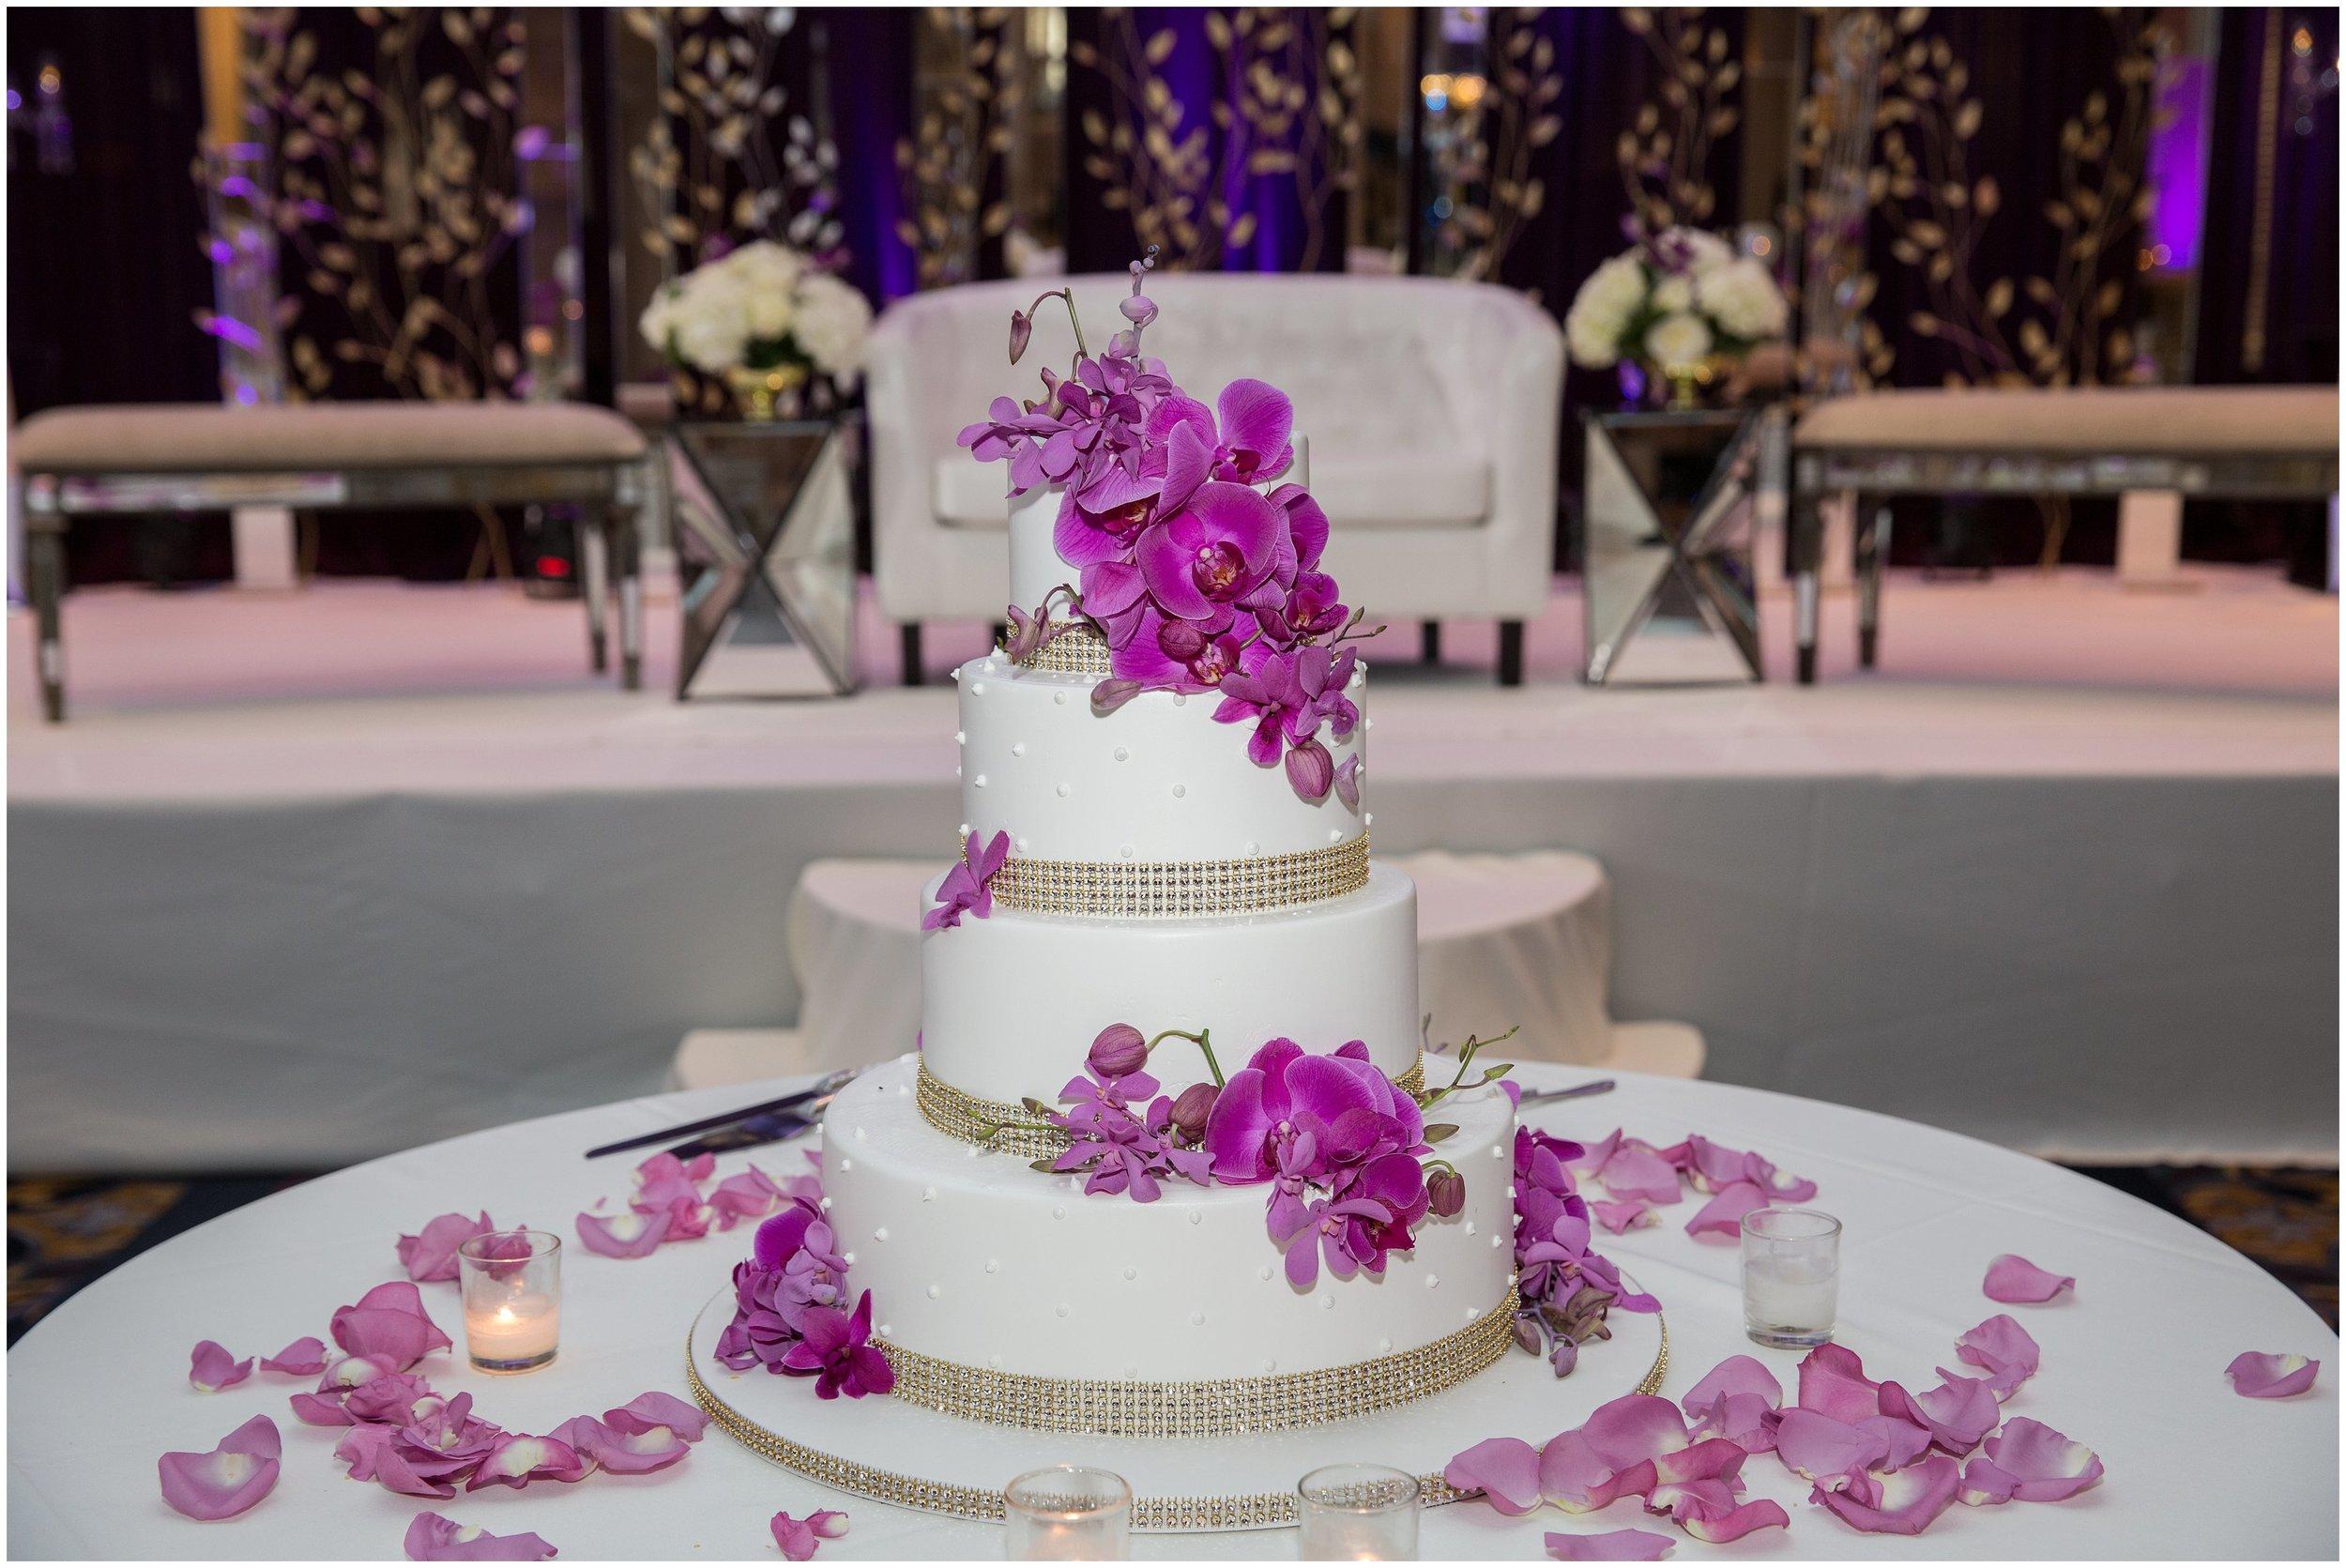 Le Cape Weddings - South Asian Wedding in Illinois - Tanvi and Anshul -0532-2_LuxuryDestinationPhotographer.jpg